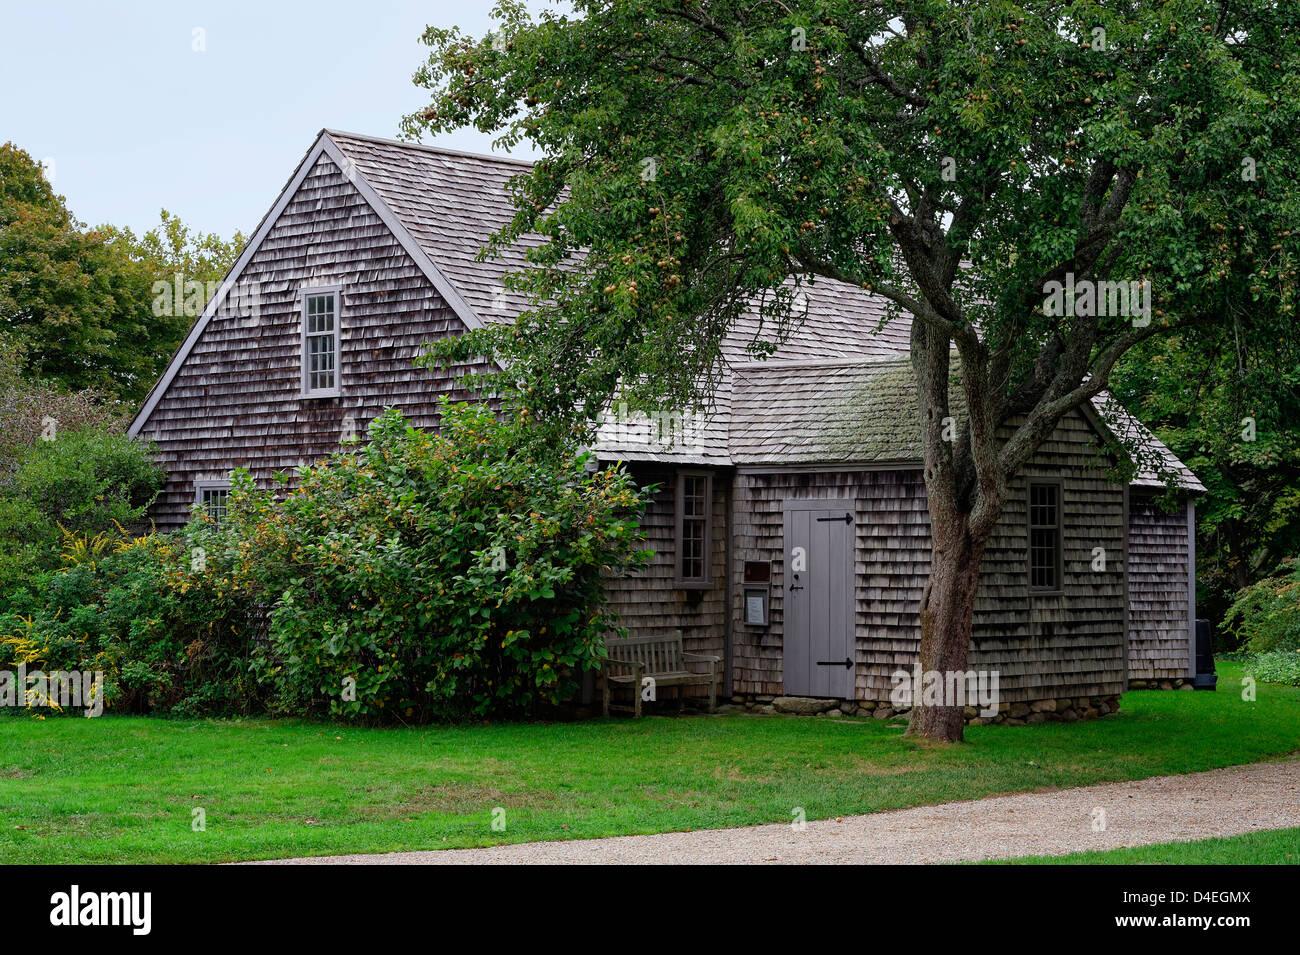 The Vincent House Museum, Edgartown, Martha's Vineyard, Massachusetts, USA - Stock Image